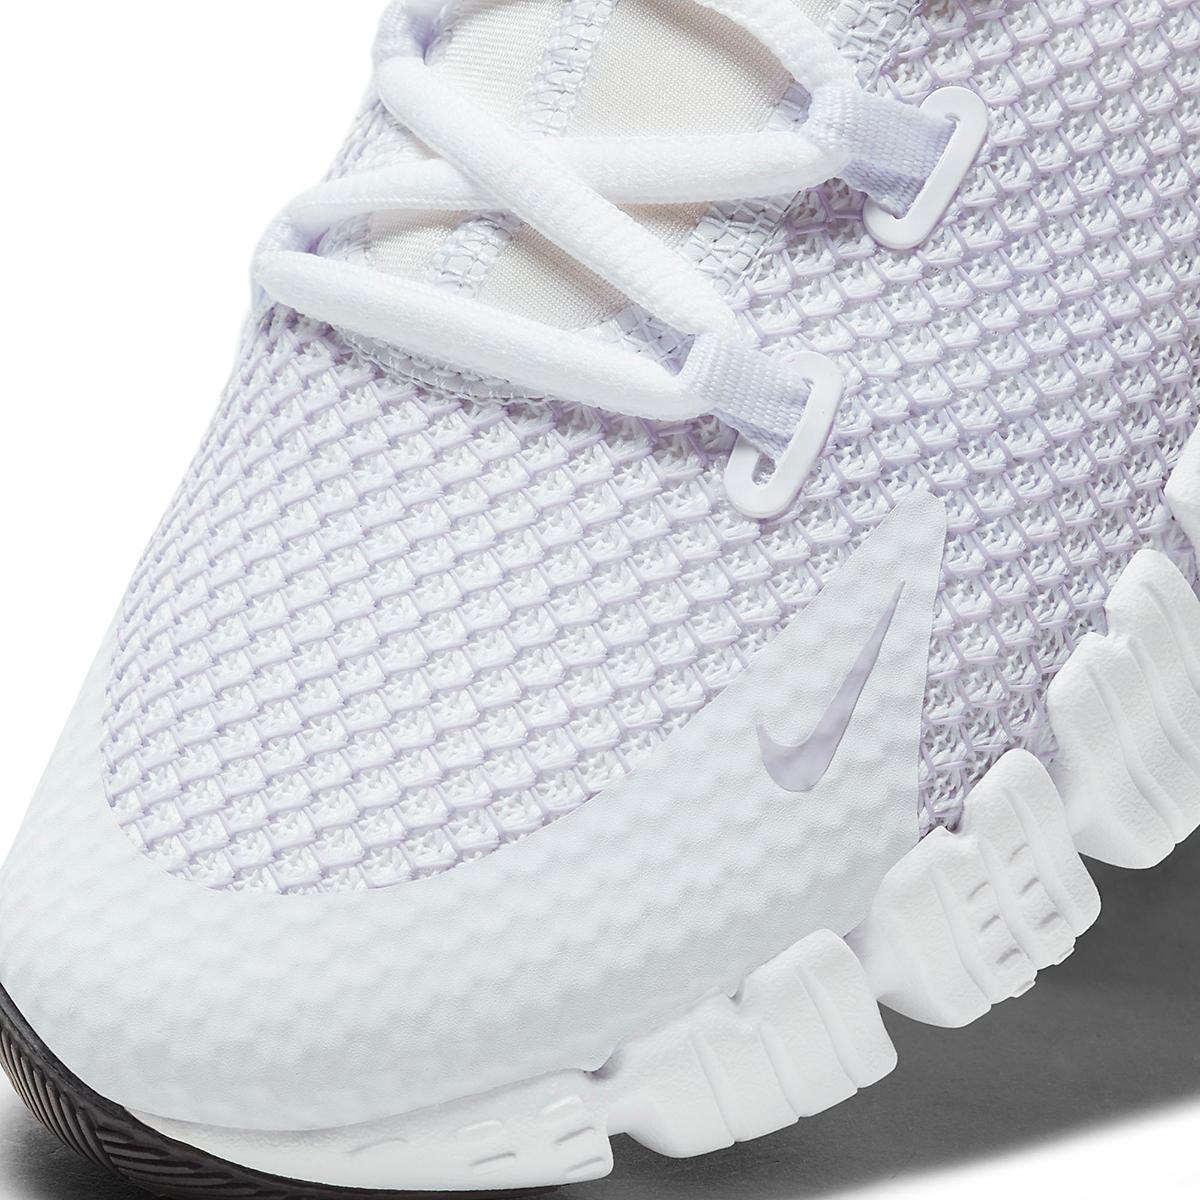 Women's Nike Free Metcon 4 Training Shoe - Color: White/Infinite Lilac/Smoke Grey - Size: 5 - Width: Regular, White/Infinite Lilac/Smoke Grey, large, image 4